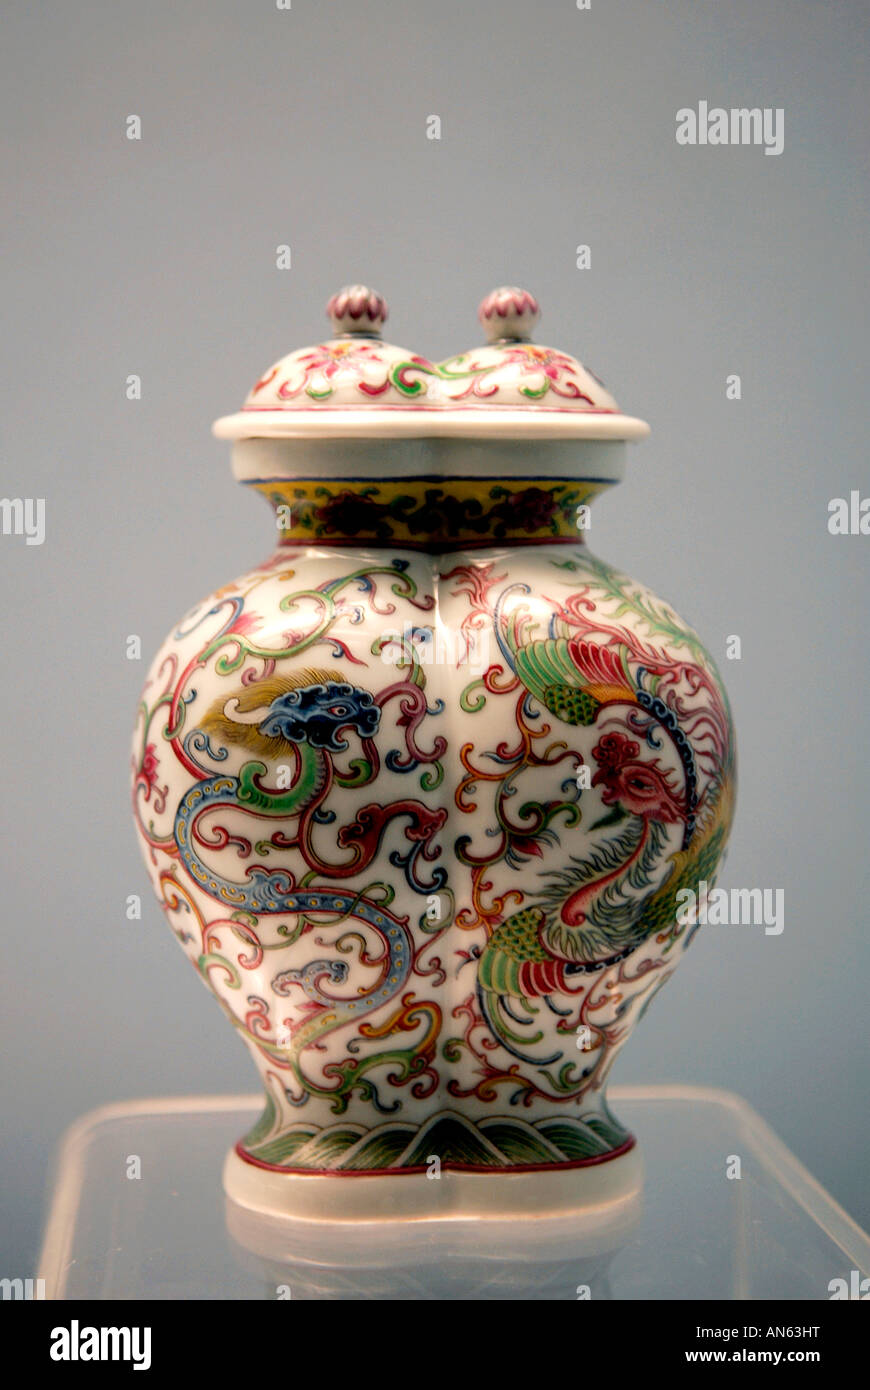 Shanghai Museum P R of China Polychrome Vase - Stock Image